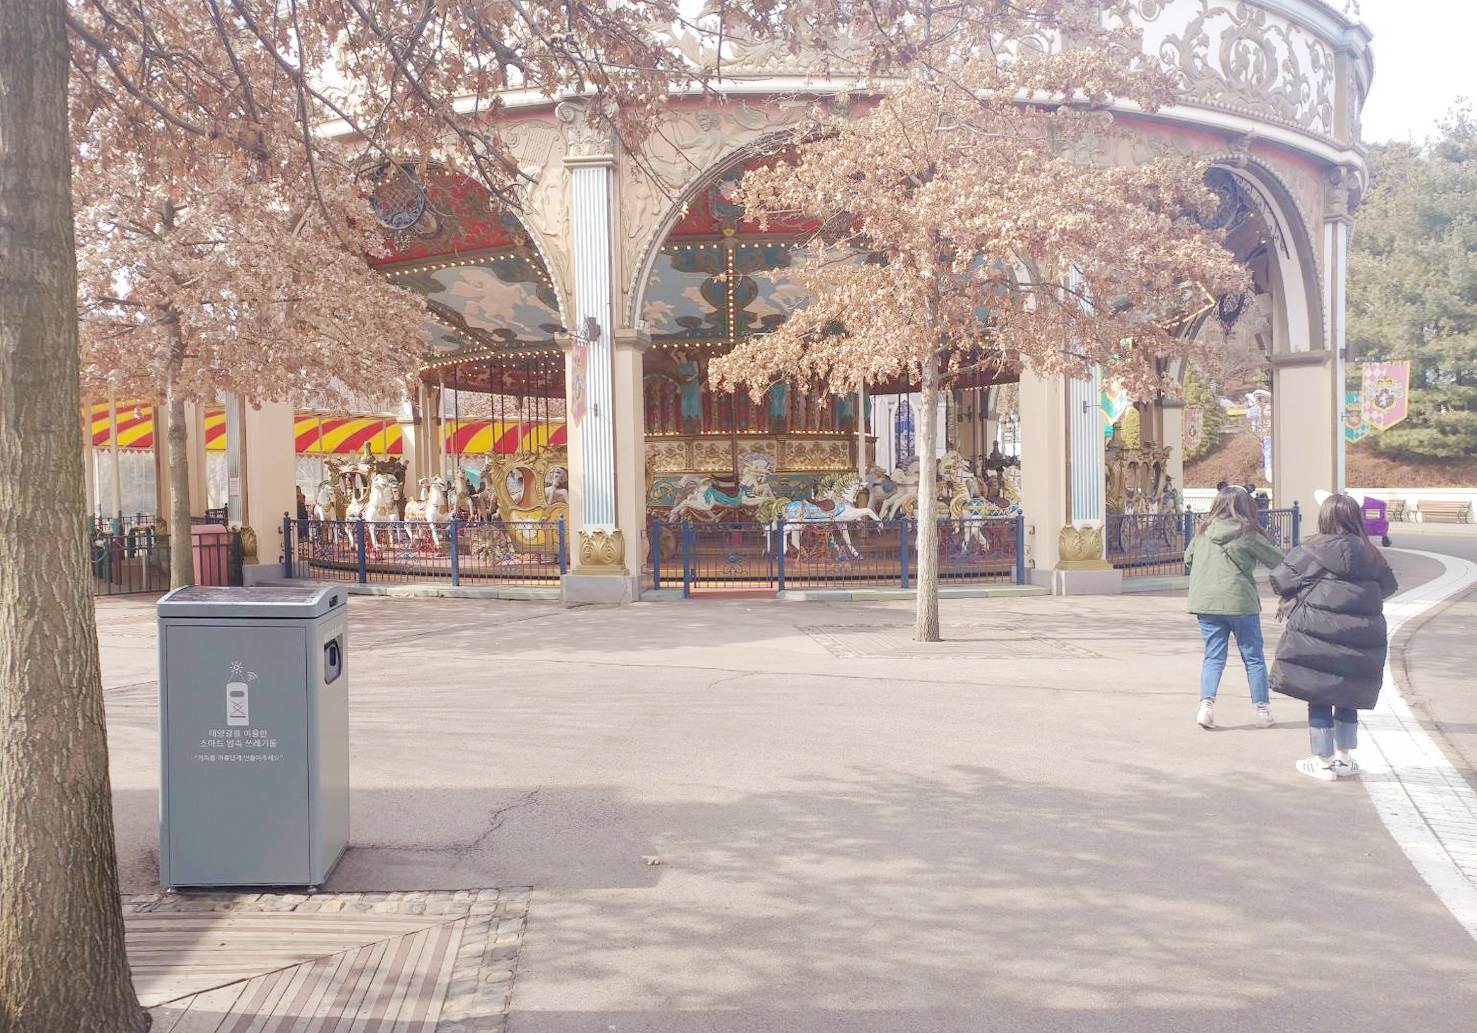 Korea's Largest Theme Park Adopts Ecube's Smart Waste Management System